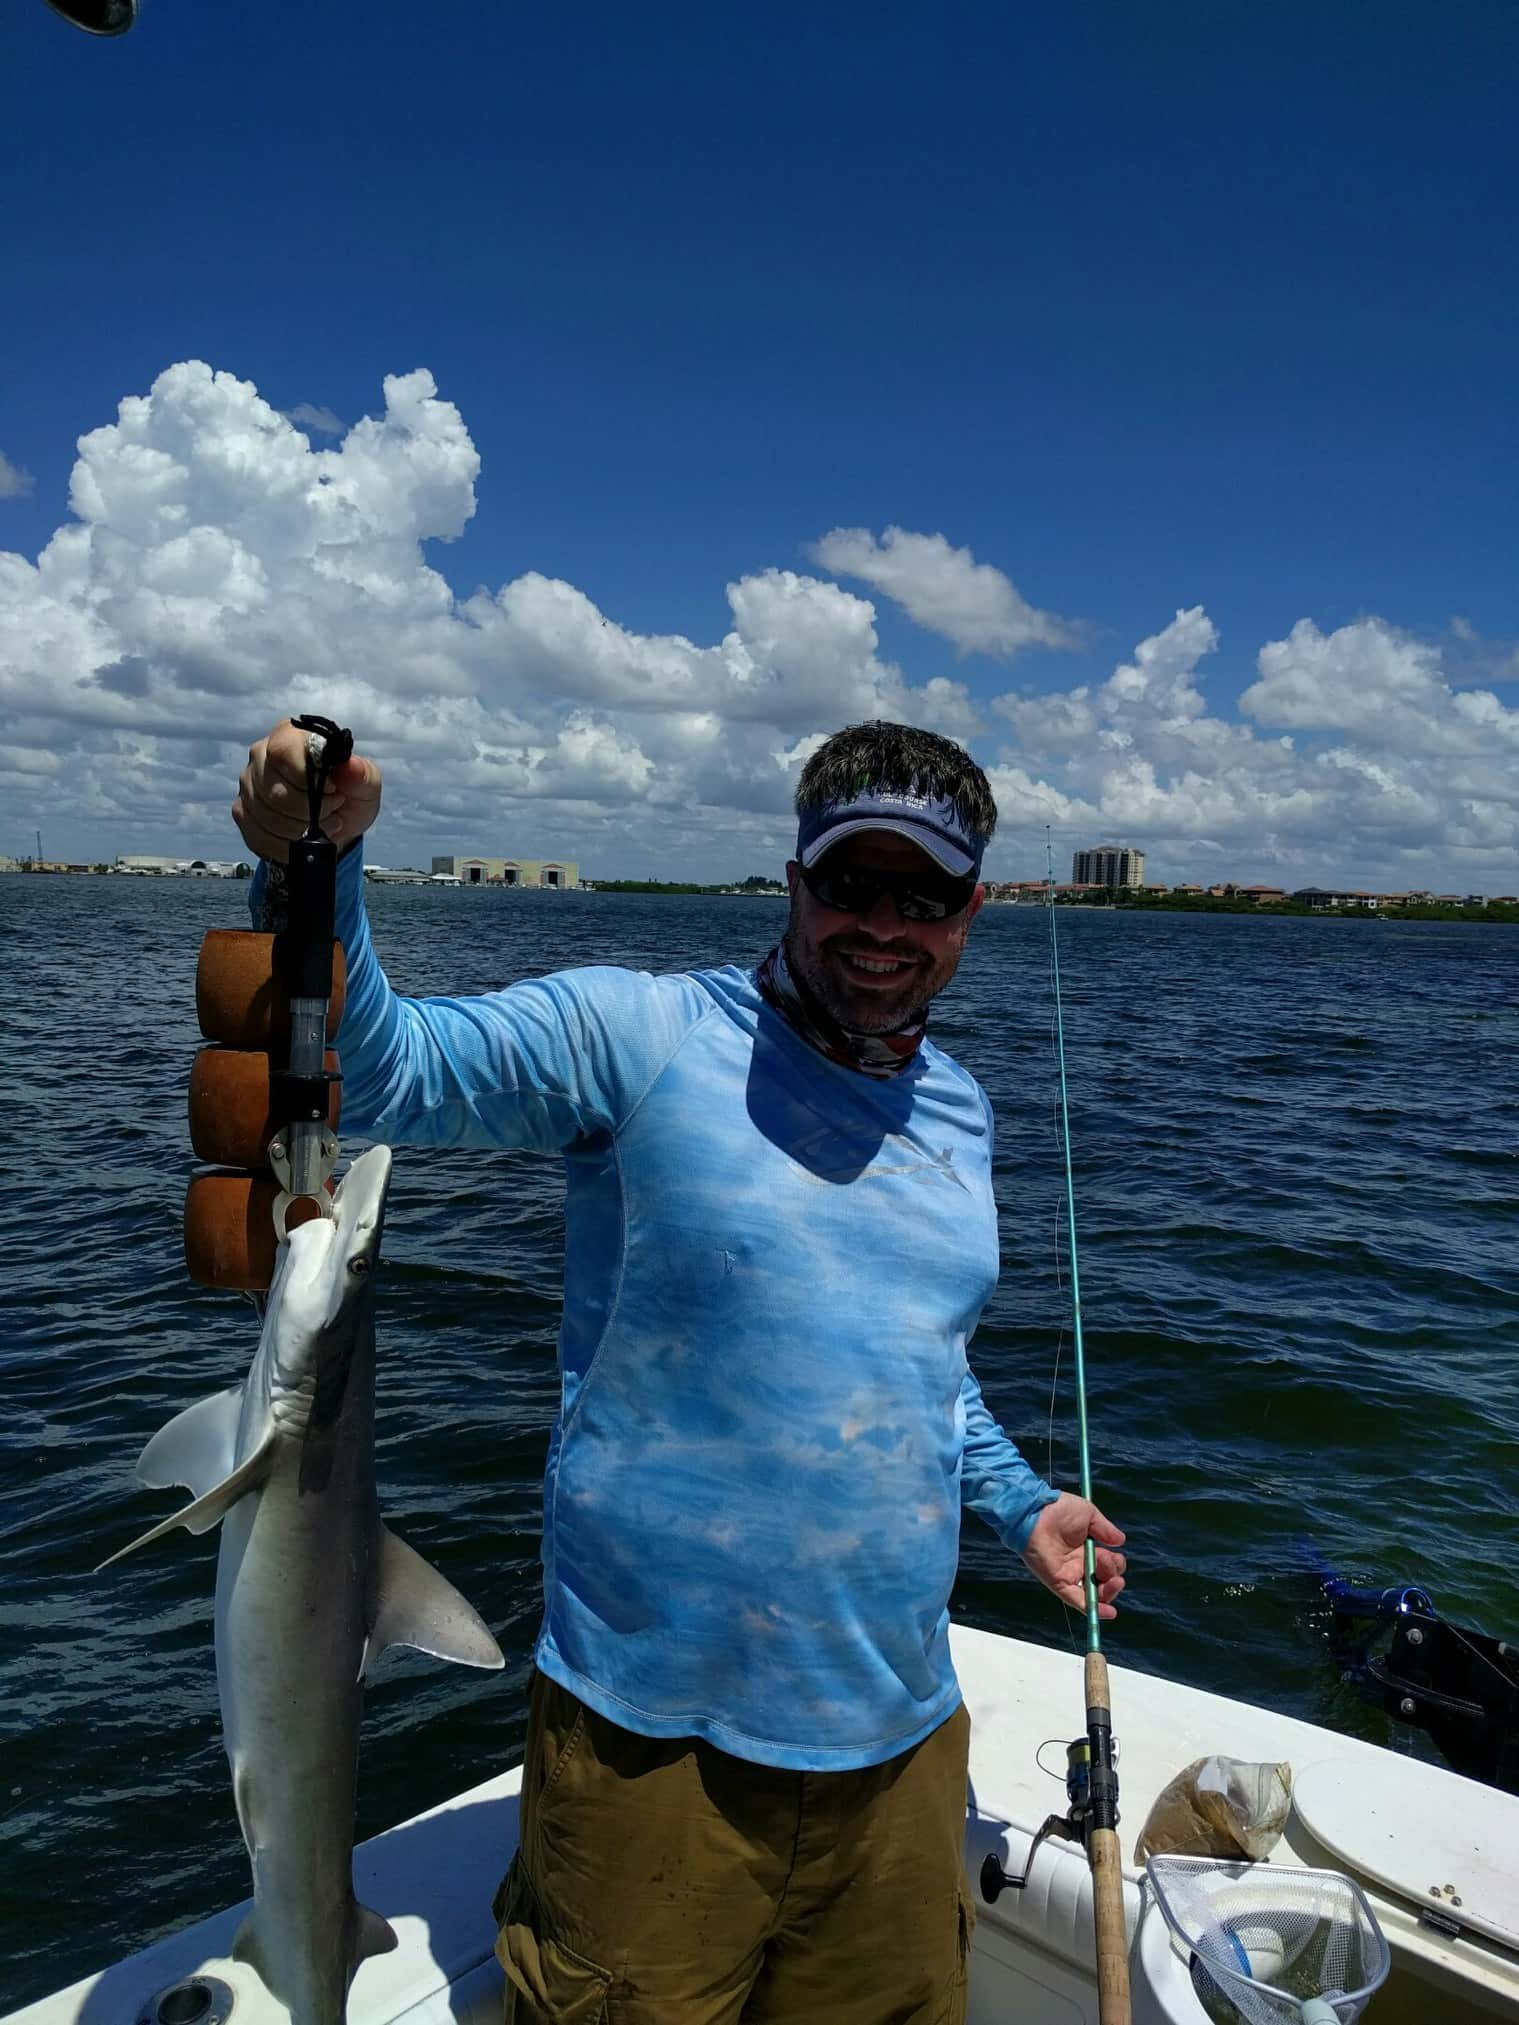 Tampa Bay Florida Fishing Charters 813 758 3406